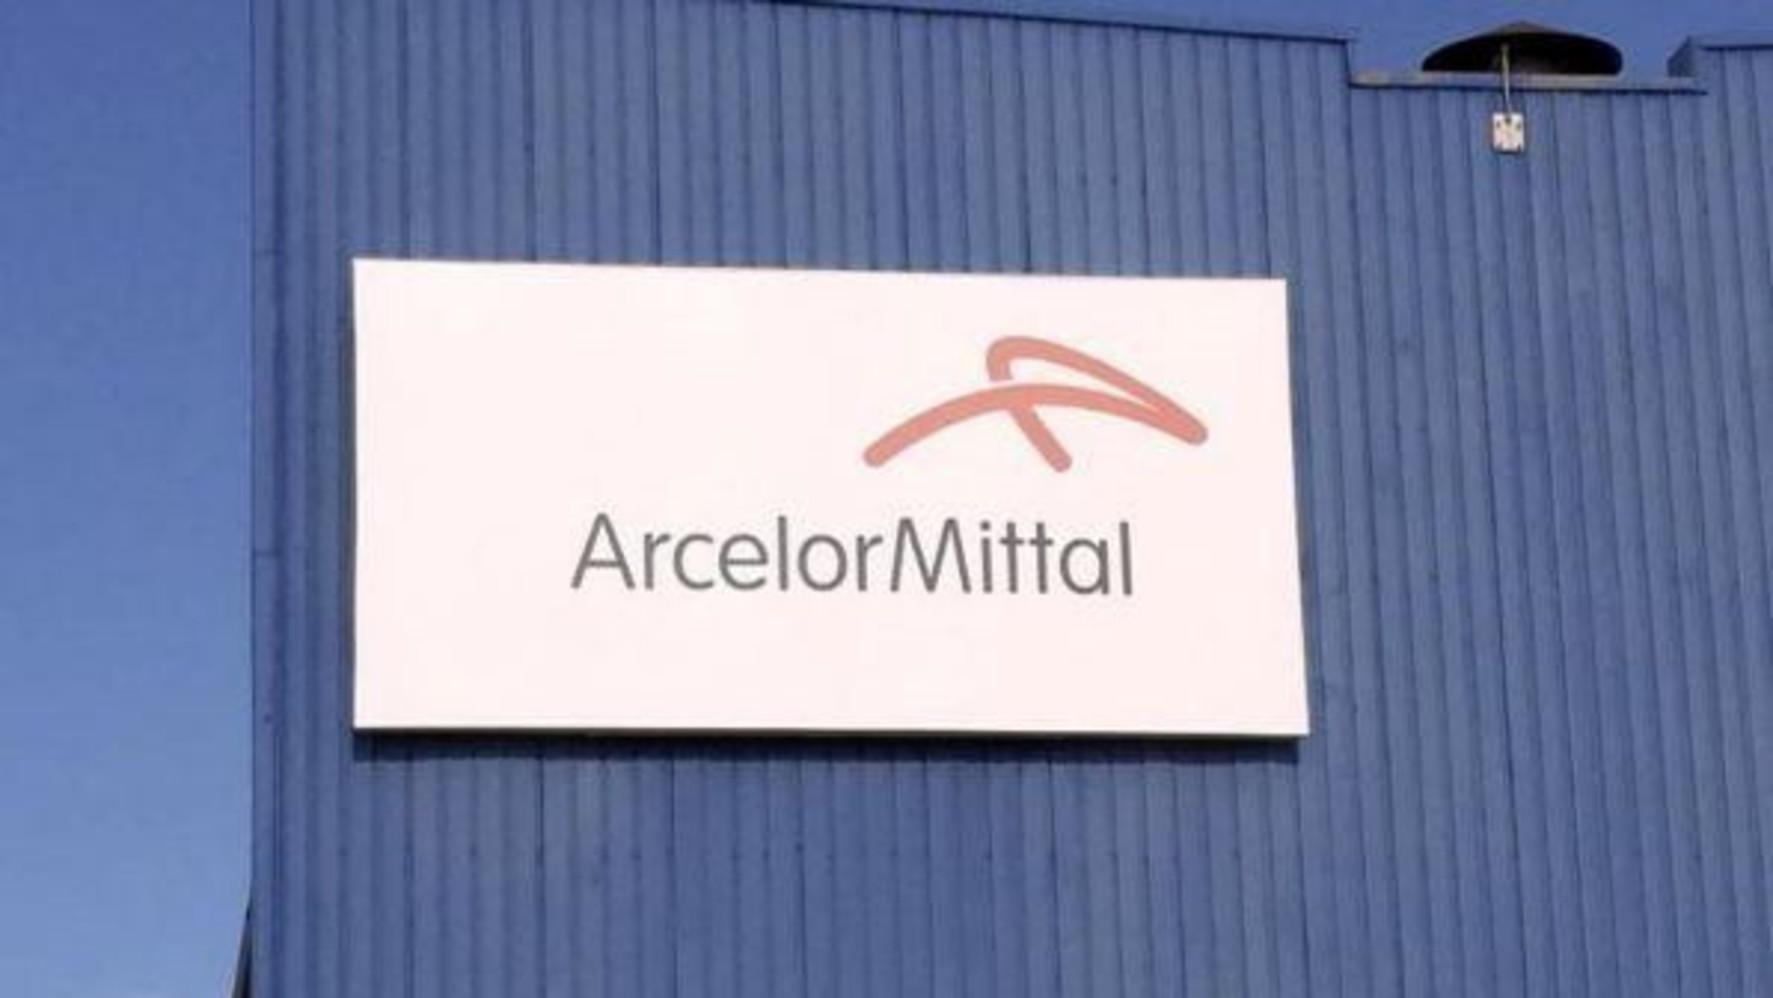 ArcelorMittal, i pm di Milano indagano per false comunicazioni e reati fallimentari - TGCOM